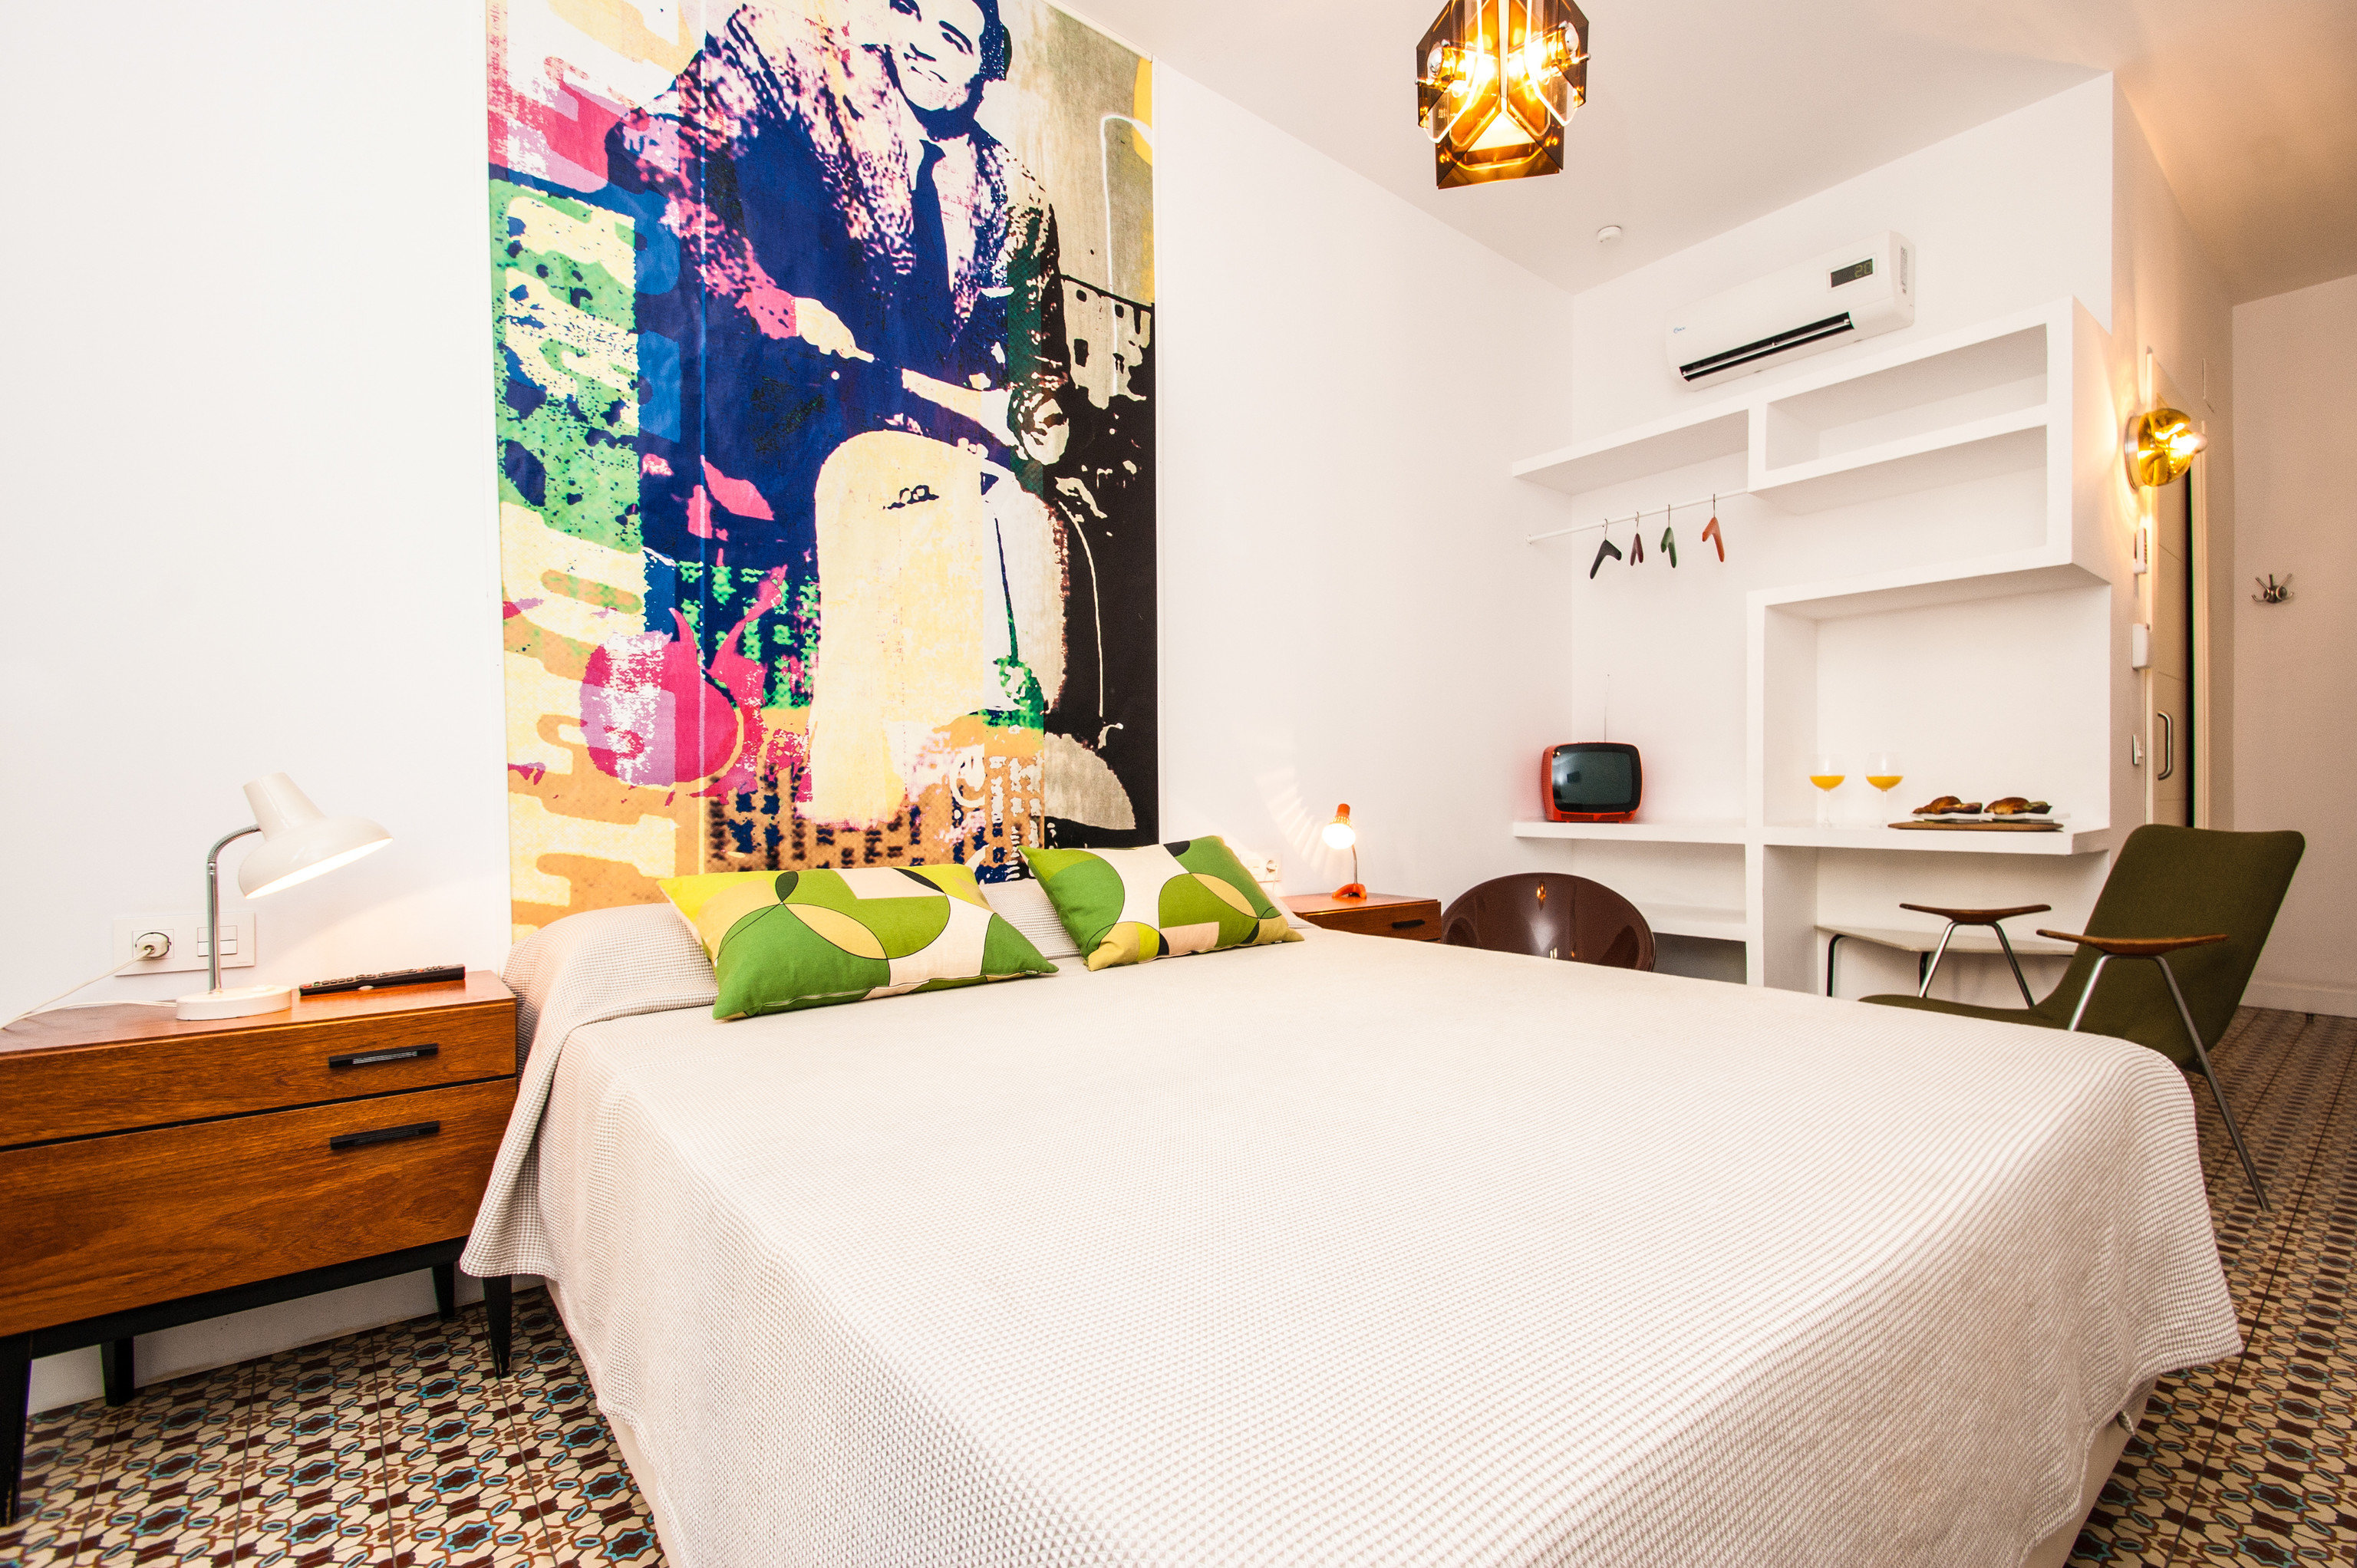 Hotels indoor wall bed room property Bedroom interior design home bed sheet Suite furniture living room cottage decorated